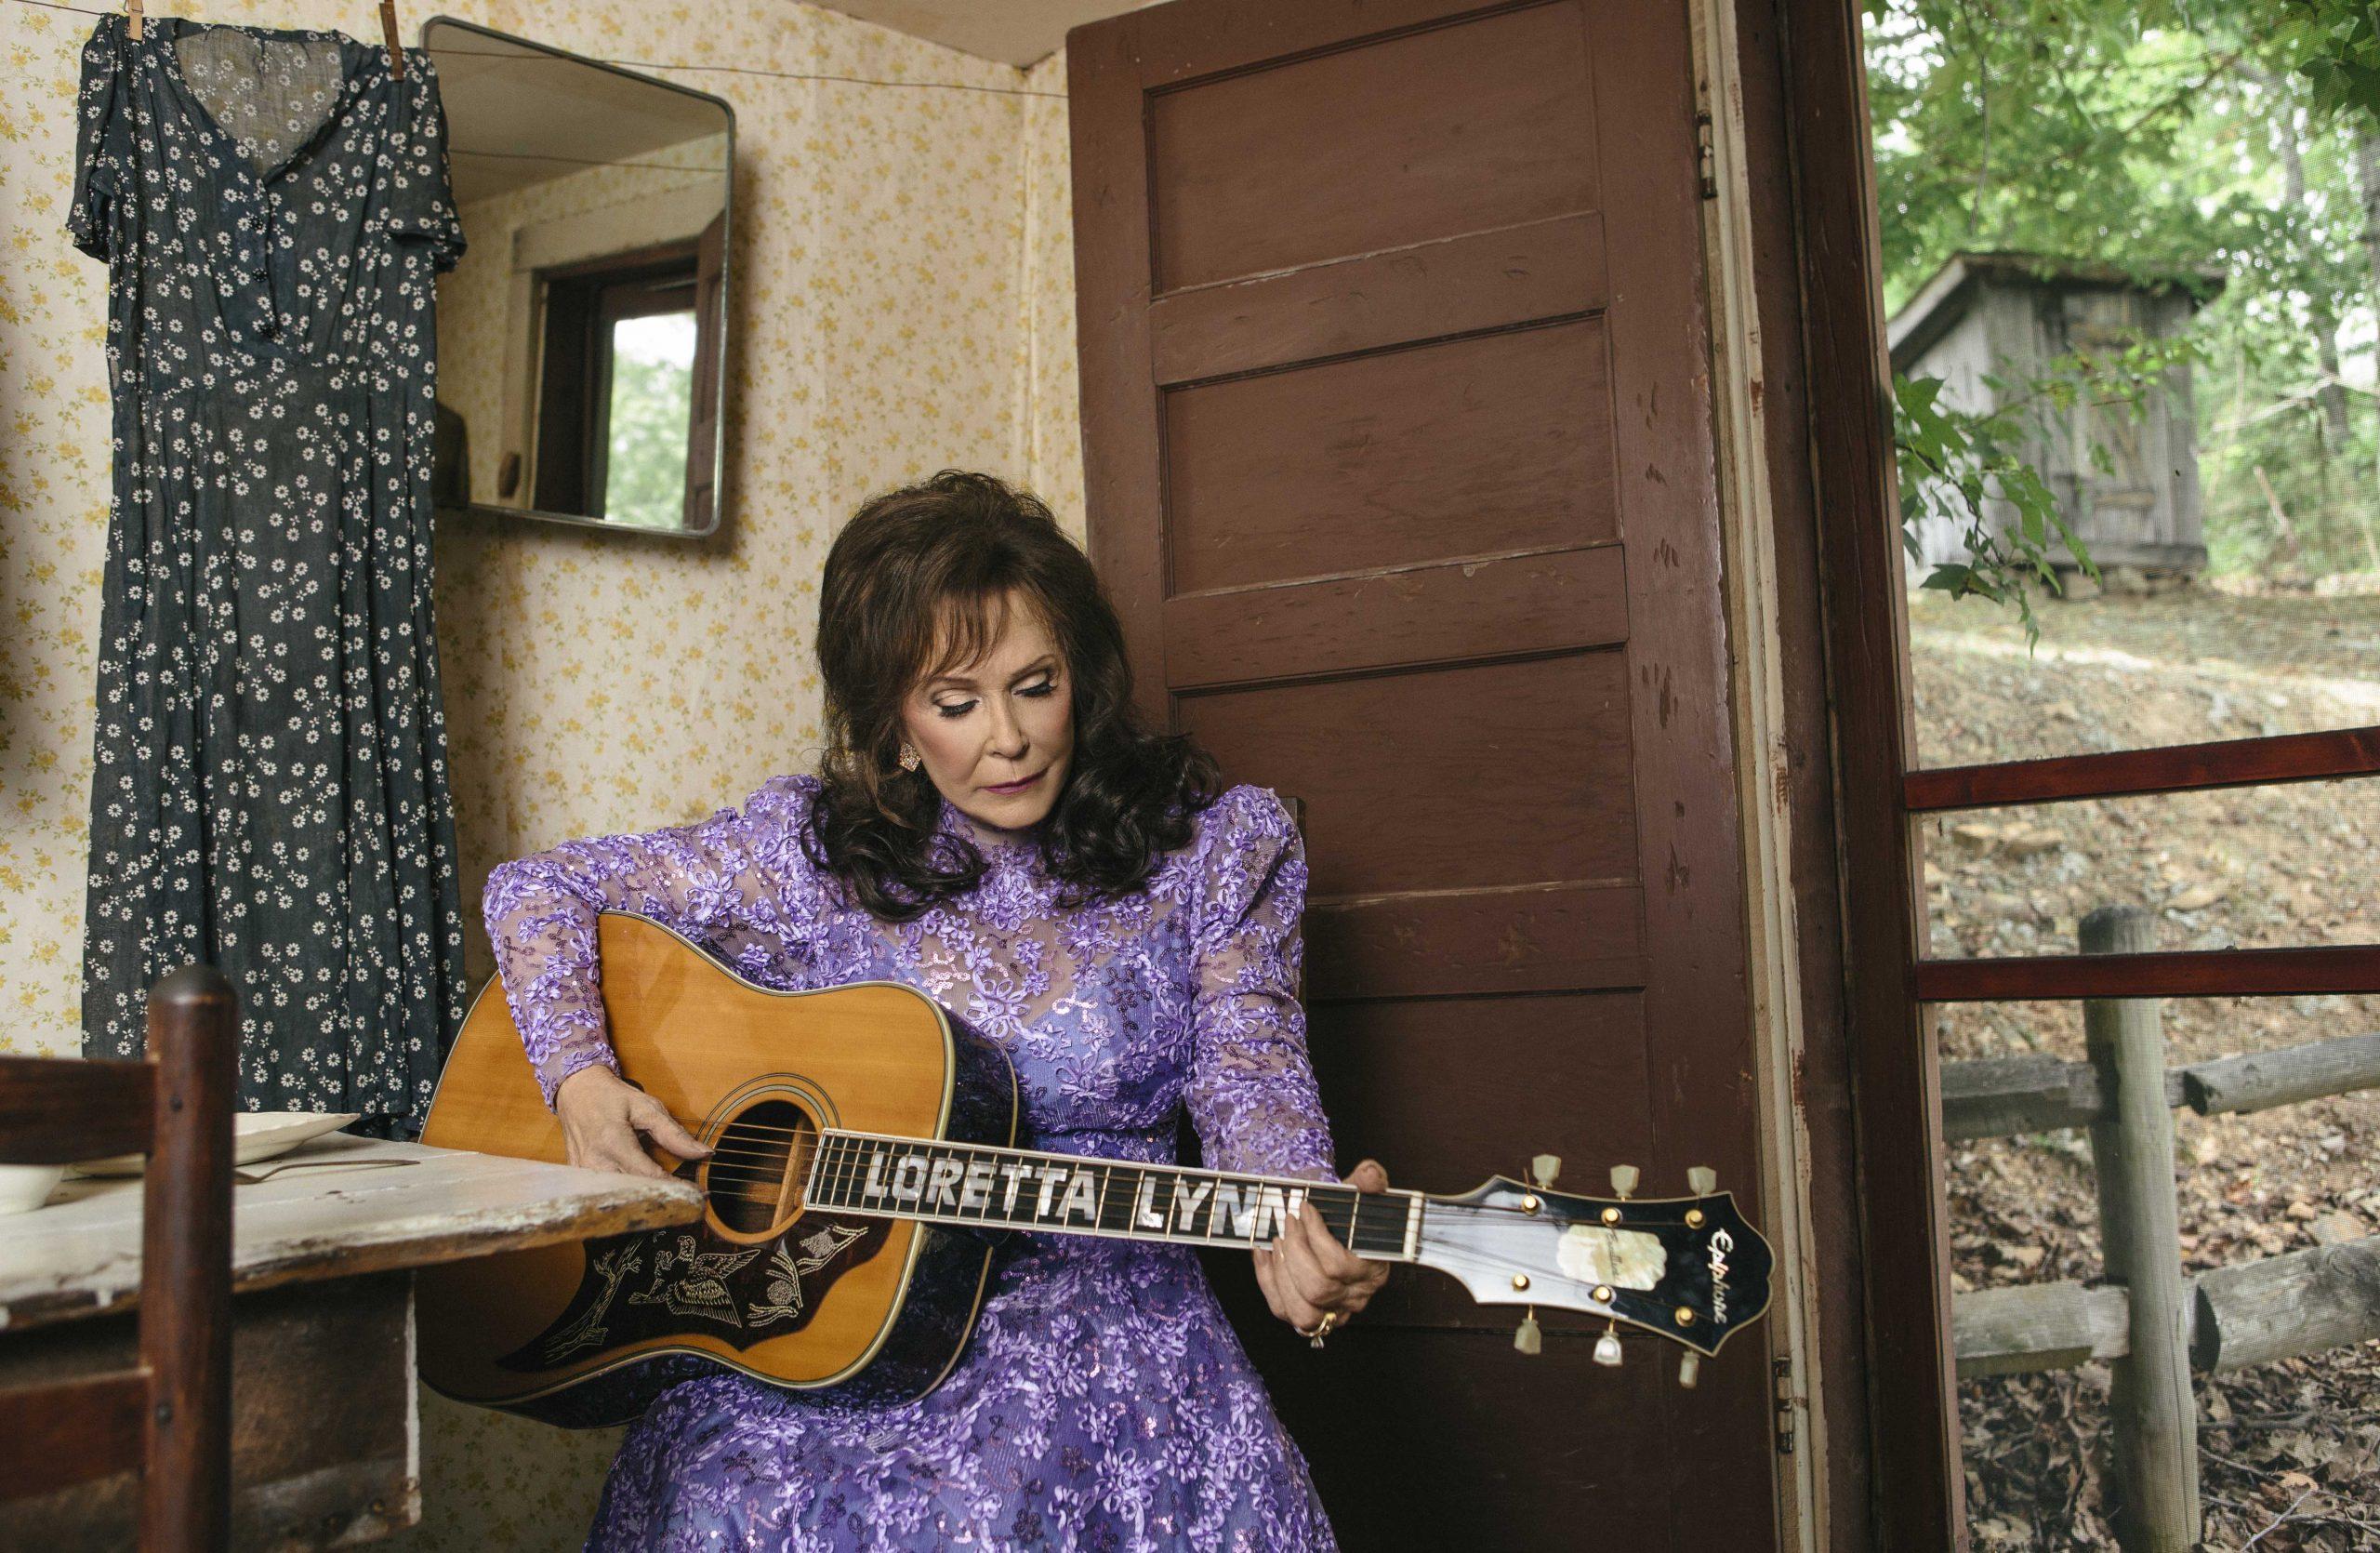 Loretta Lynn: My Story in My Words set to premiere February 27 on PBS